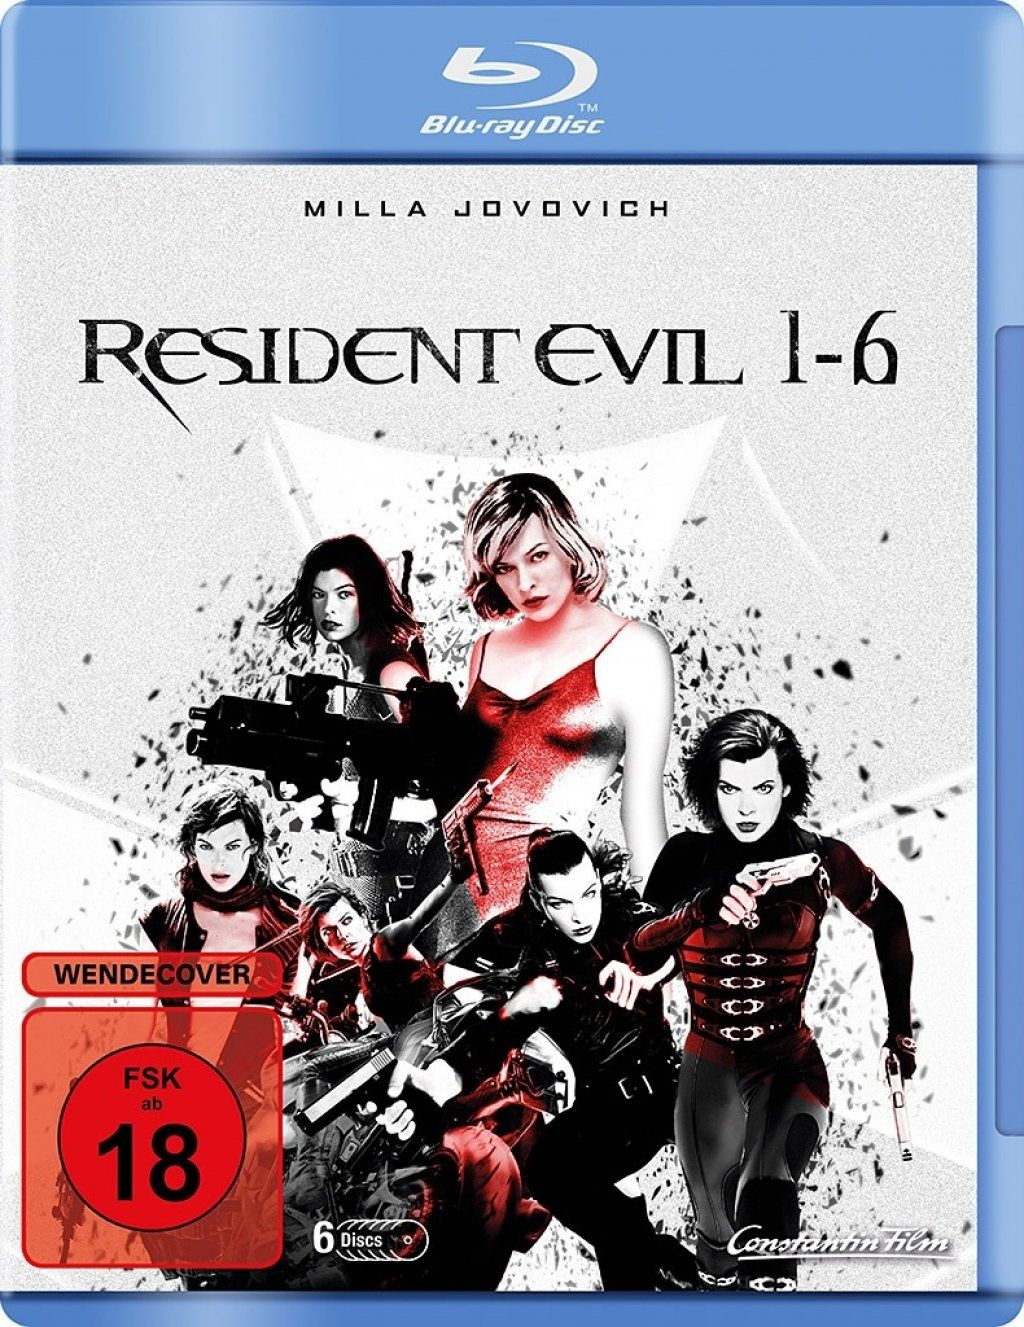 Resident Evil 1-6 (6 Discs) (BLURAY)